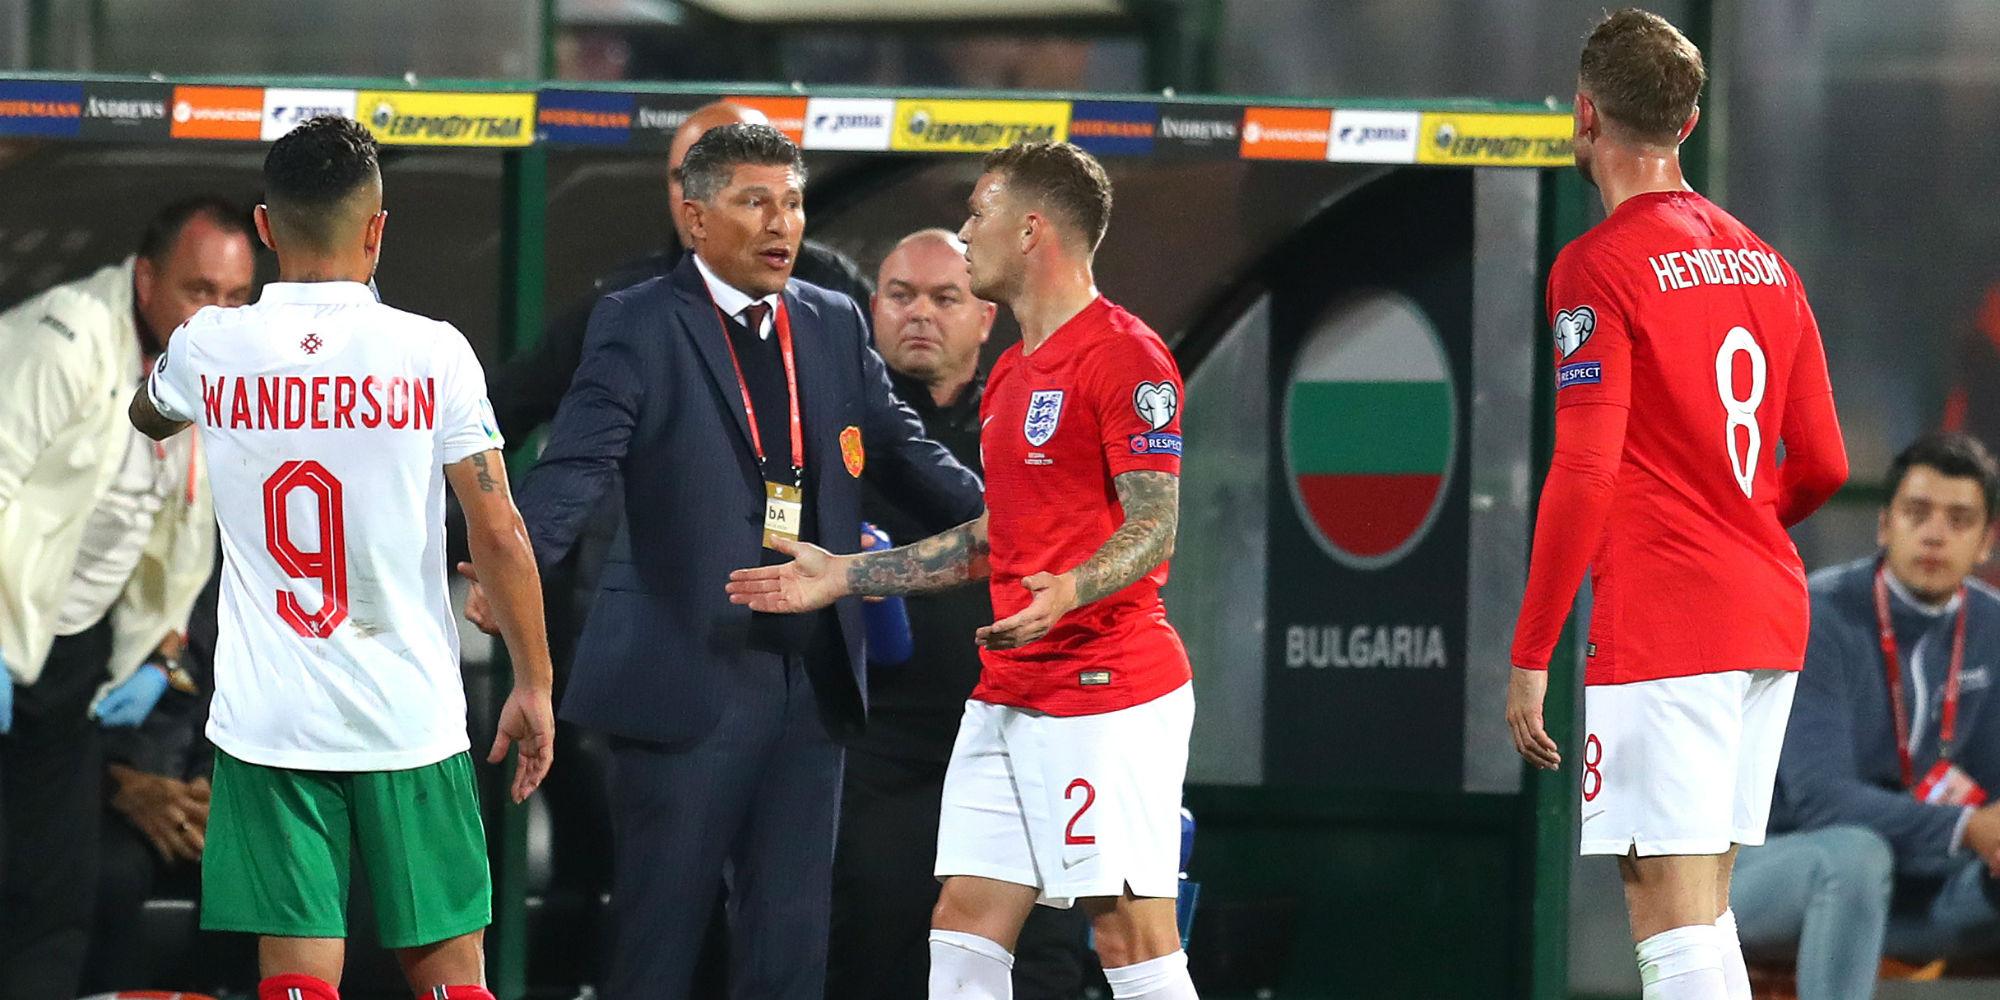 Bulgaria England Krasimir Balakov 2019